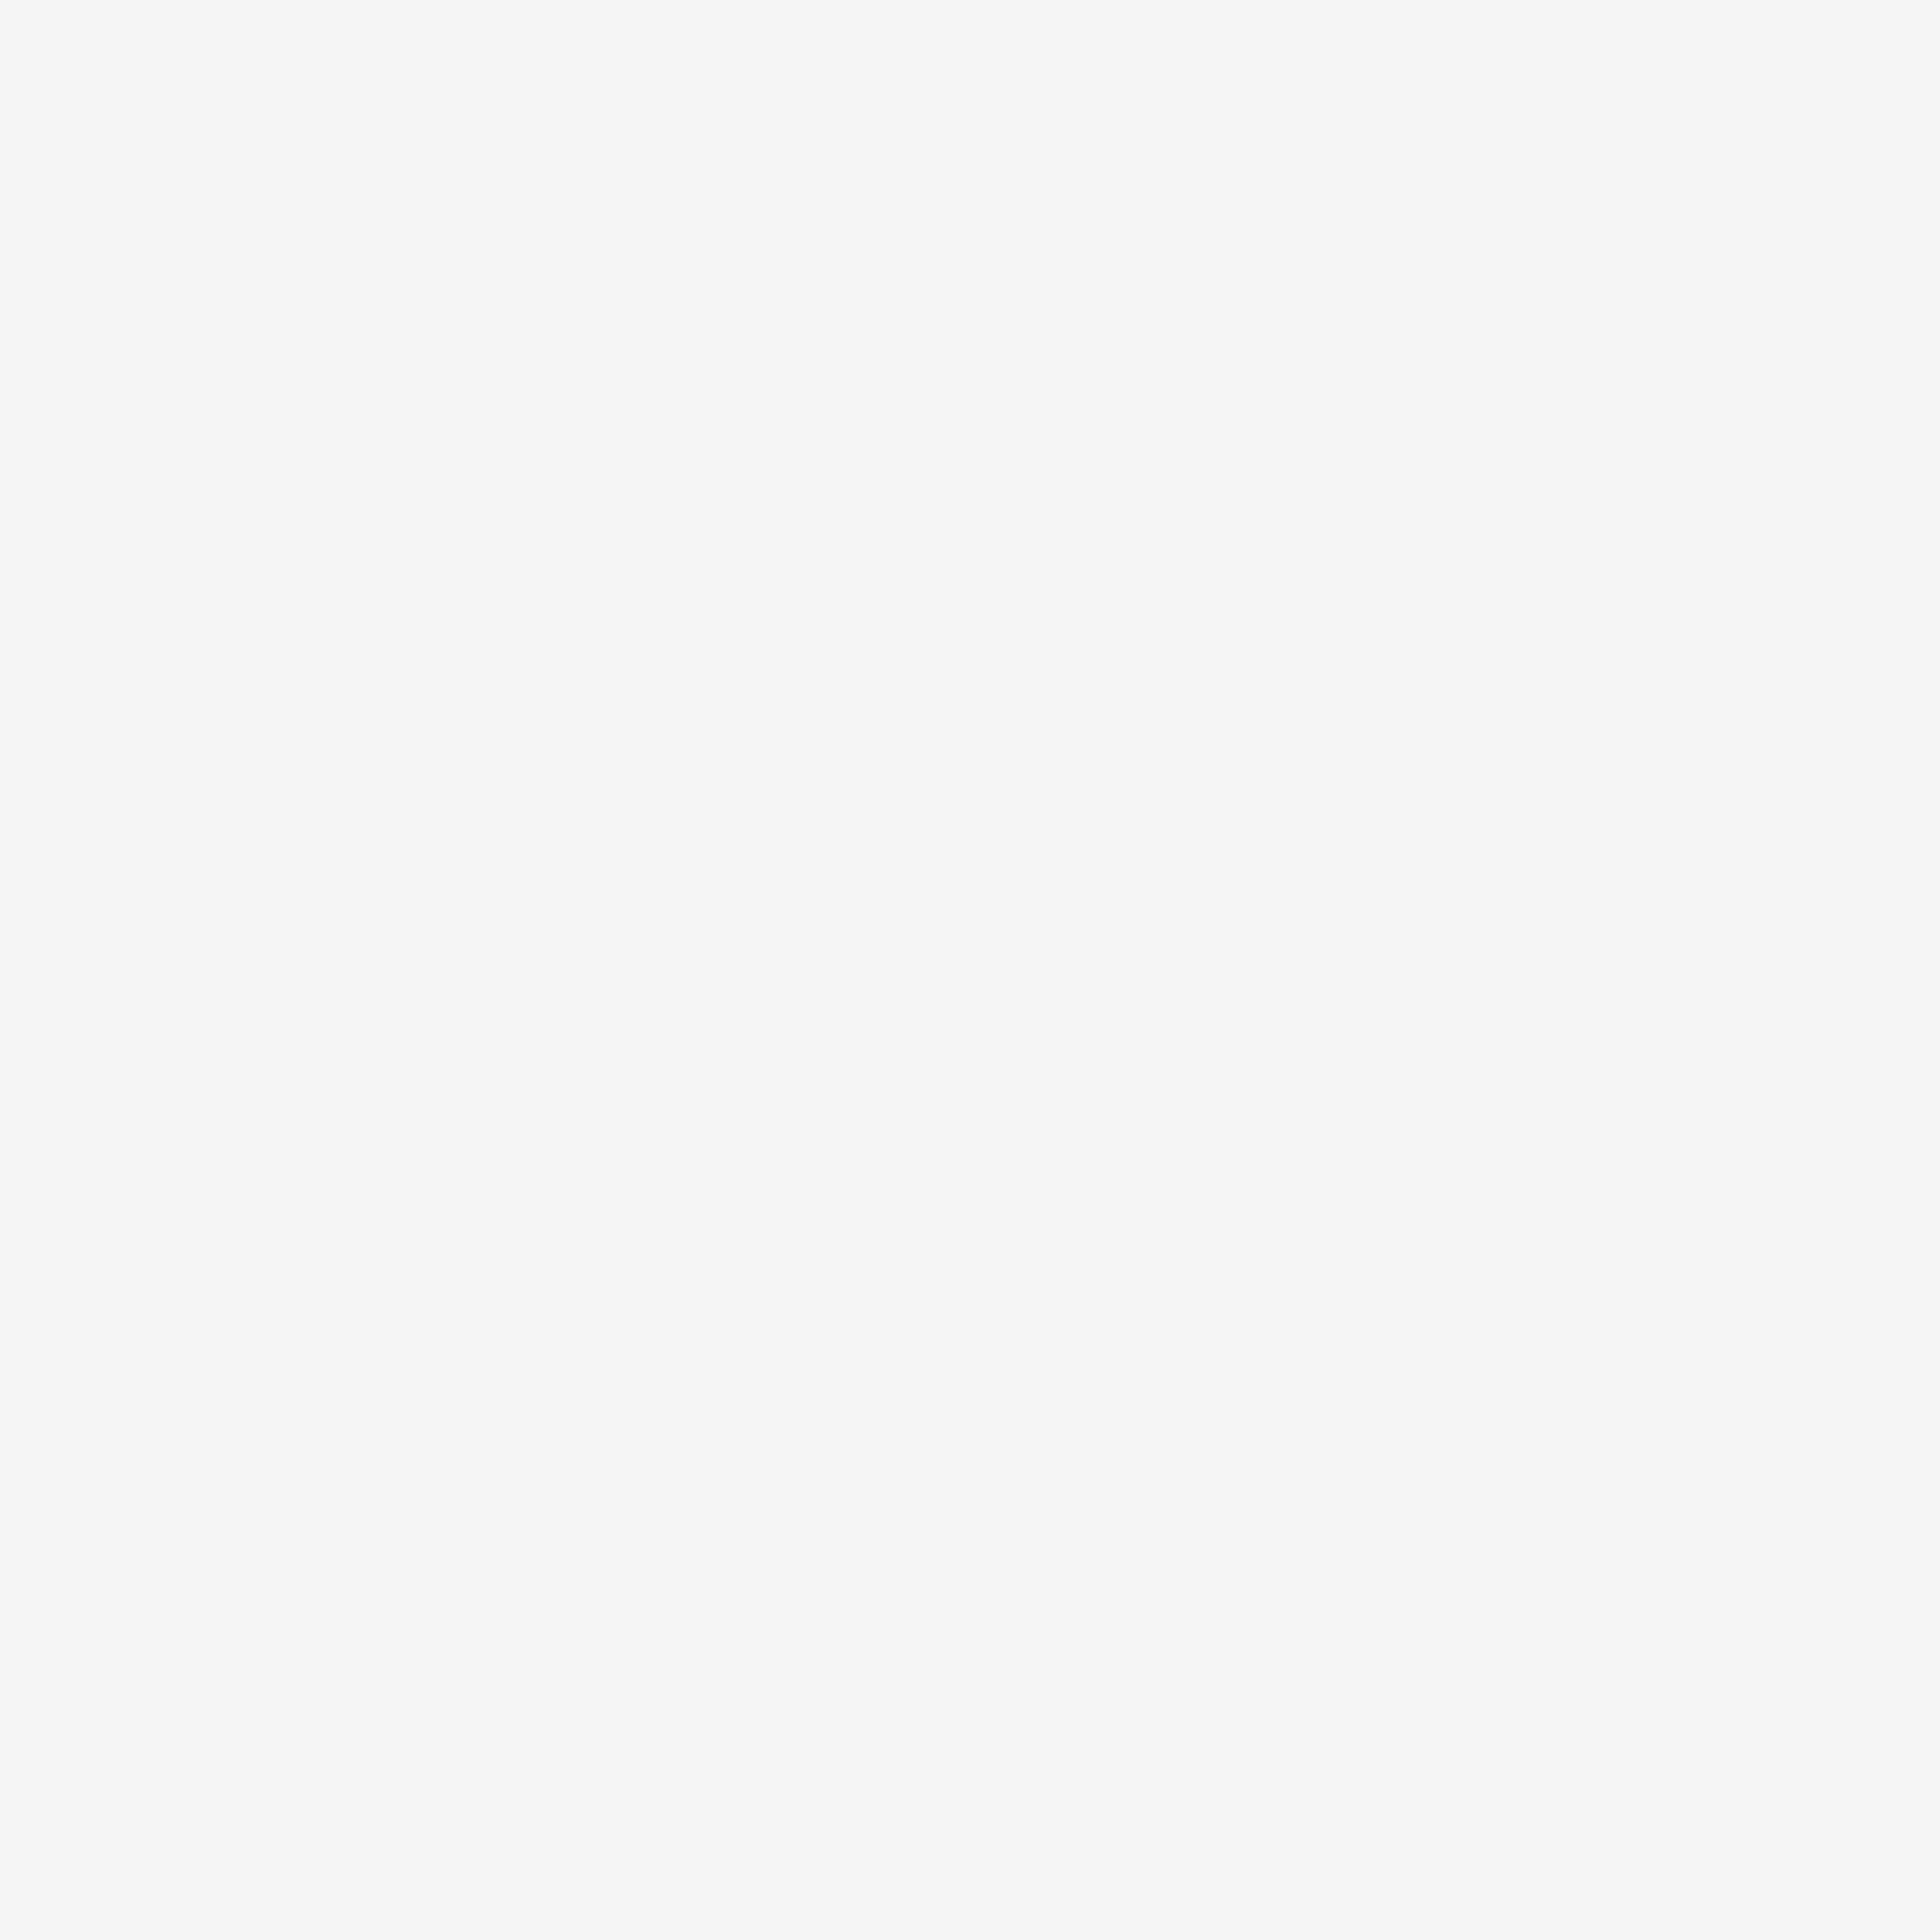 Adidas Tennis Ny Printed Shirt Shirts & polo's Tennis